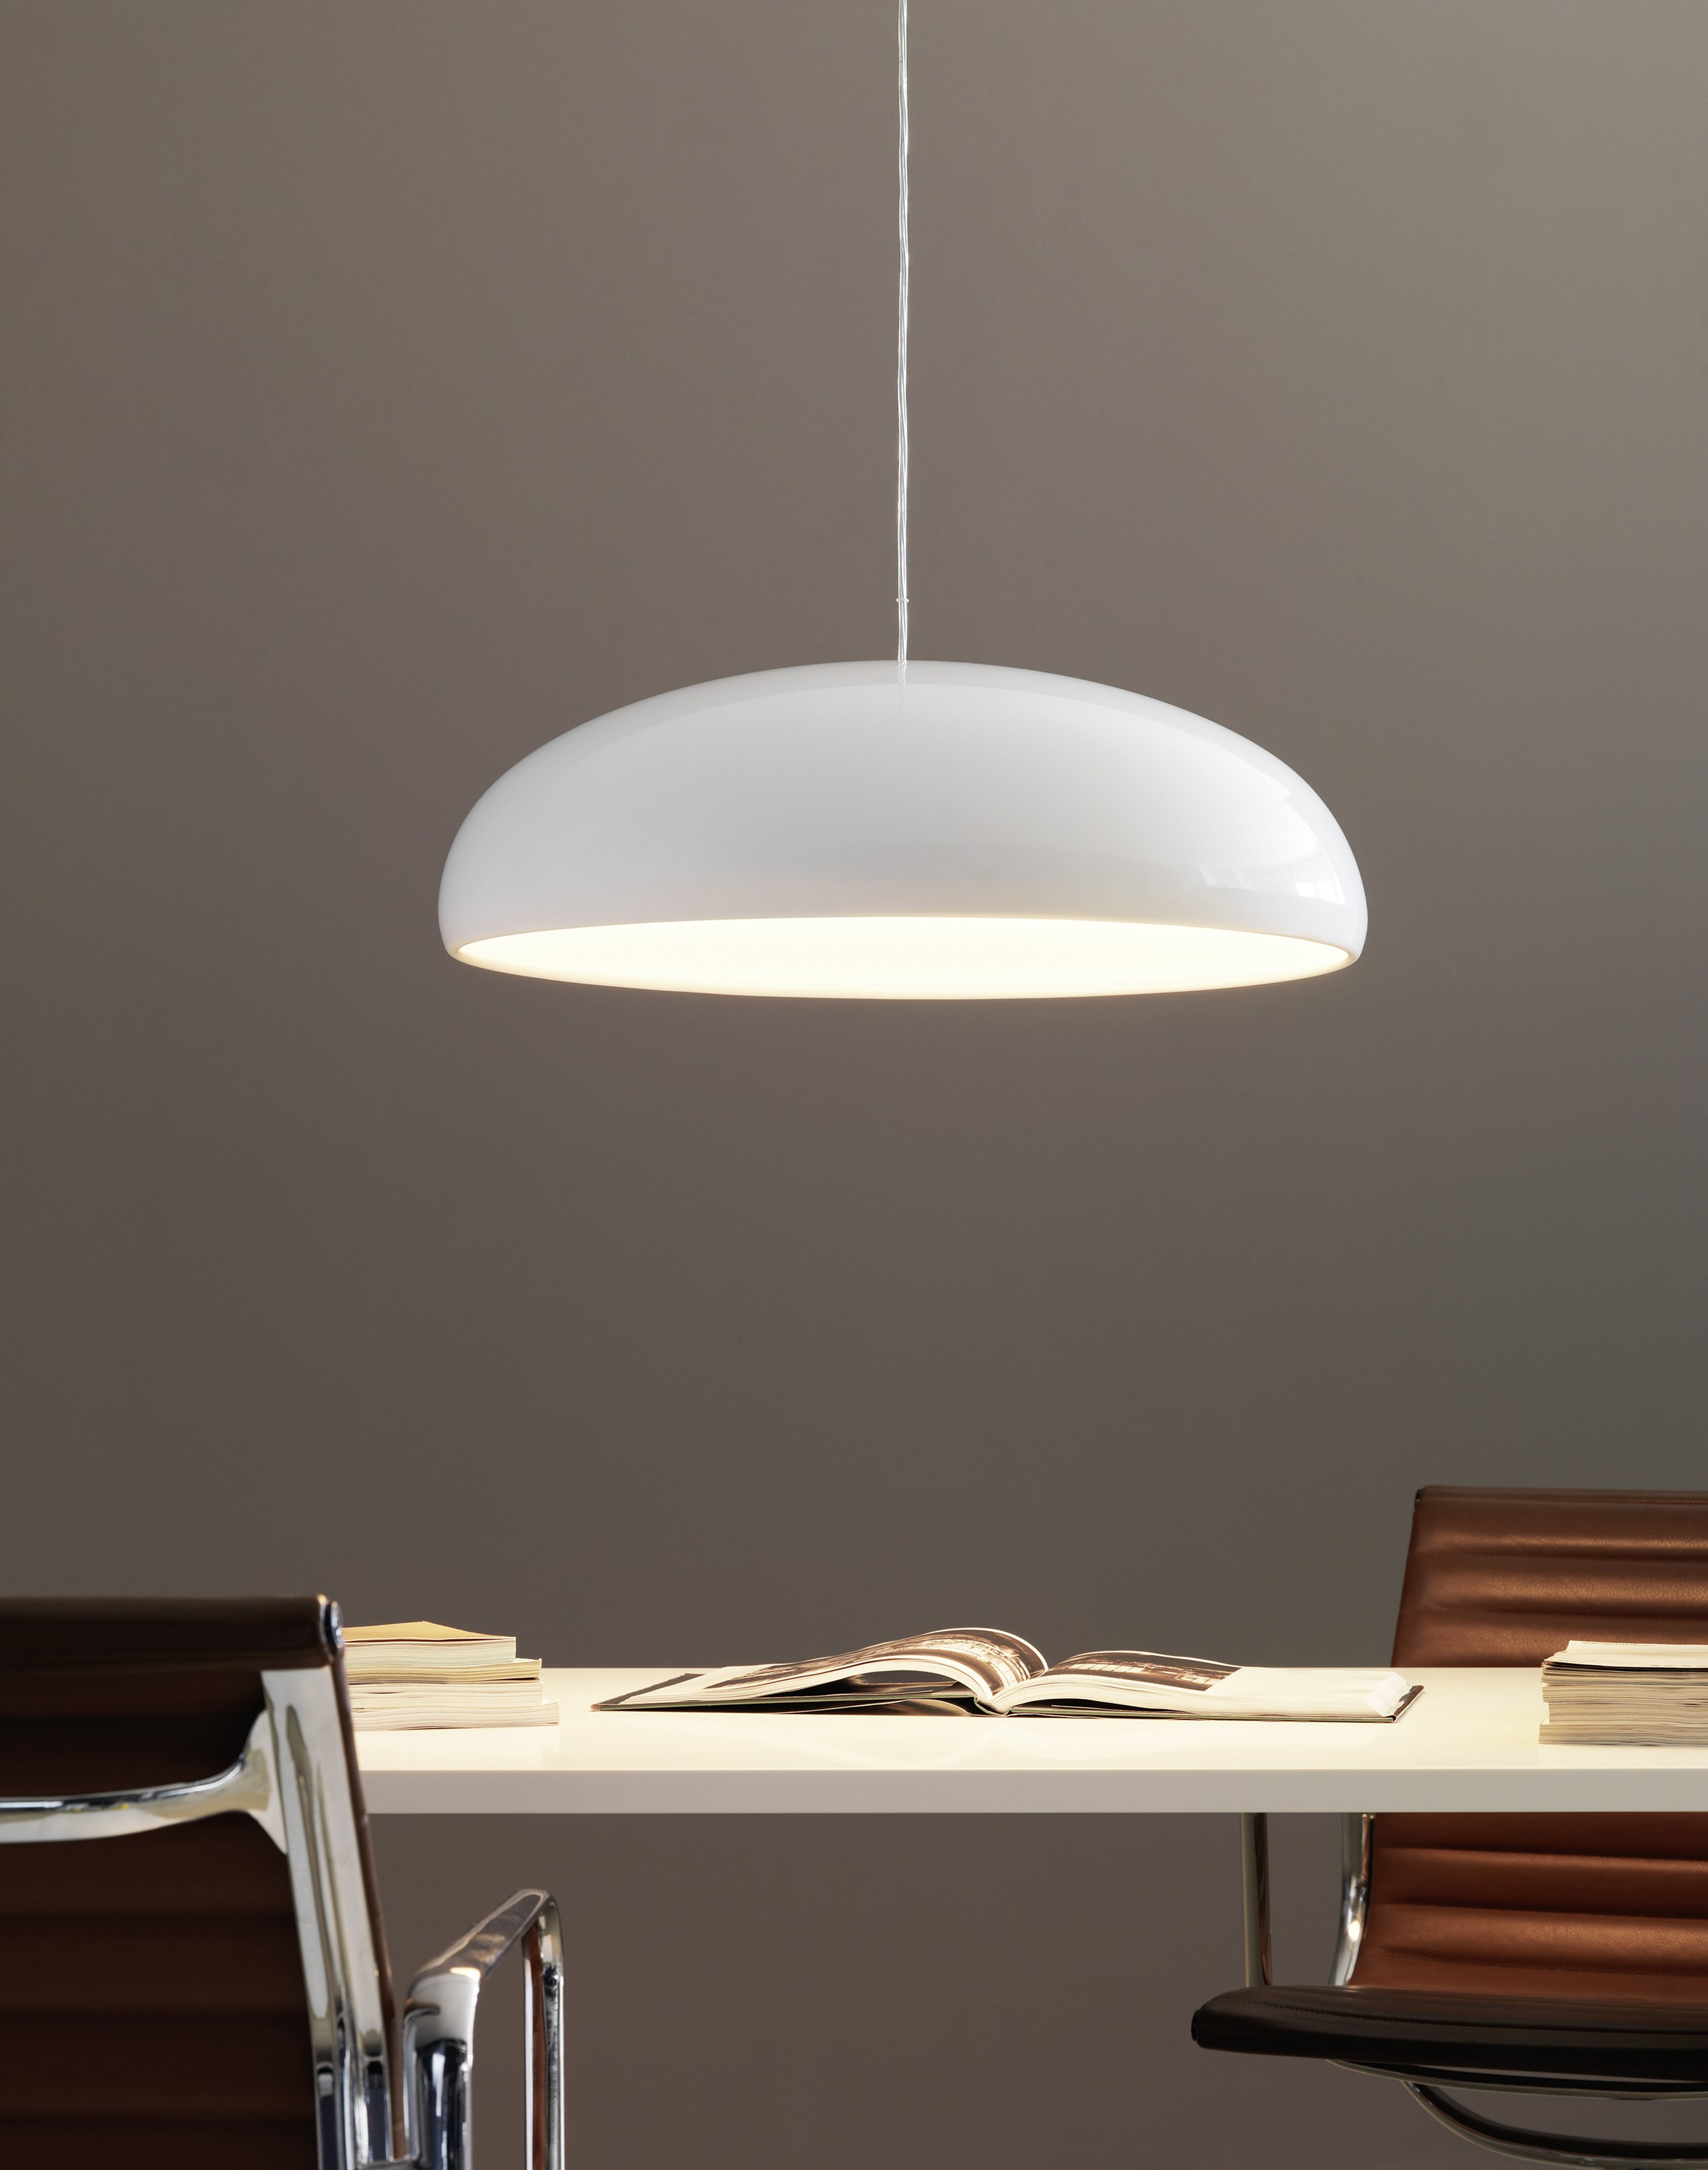 Fontana Arte Pangen lampada Lampada a sospensione LED 4334V ...